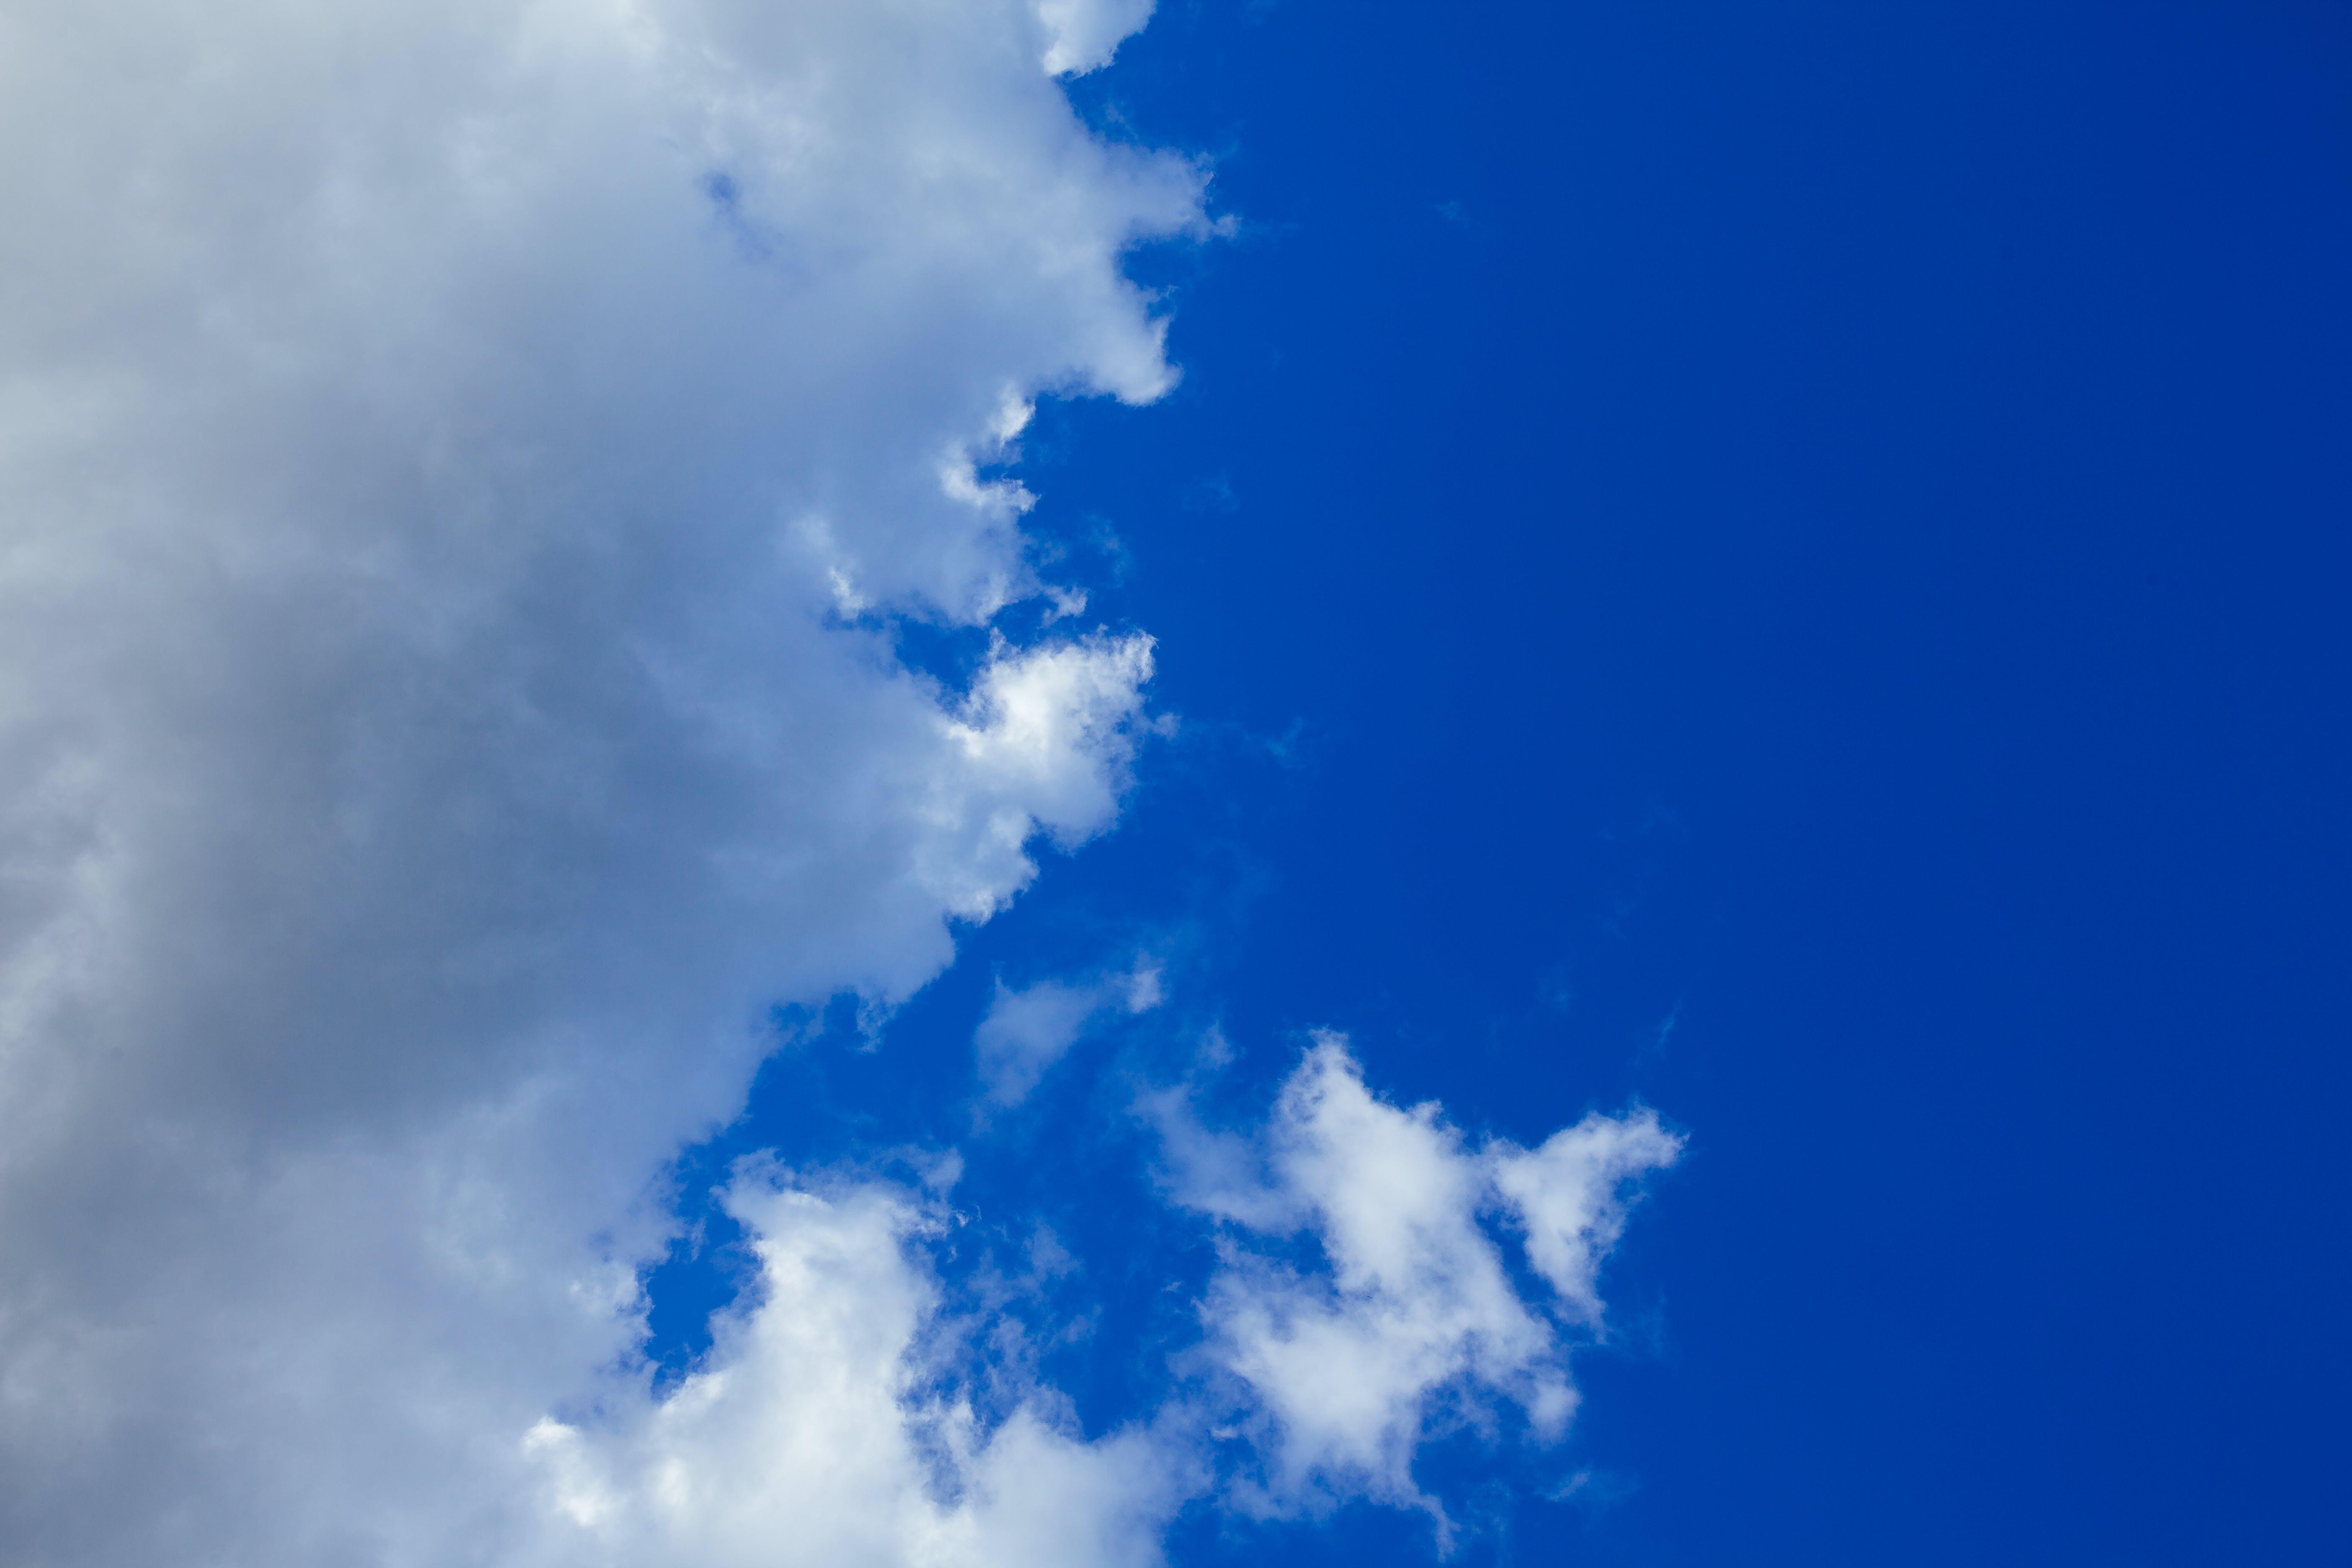 Kostenloses Stock Foto zu bewölkt, blau, flaumig, himmel